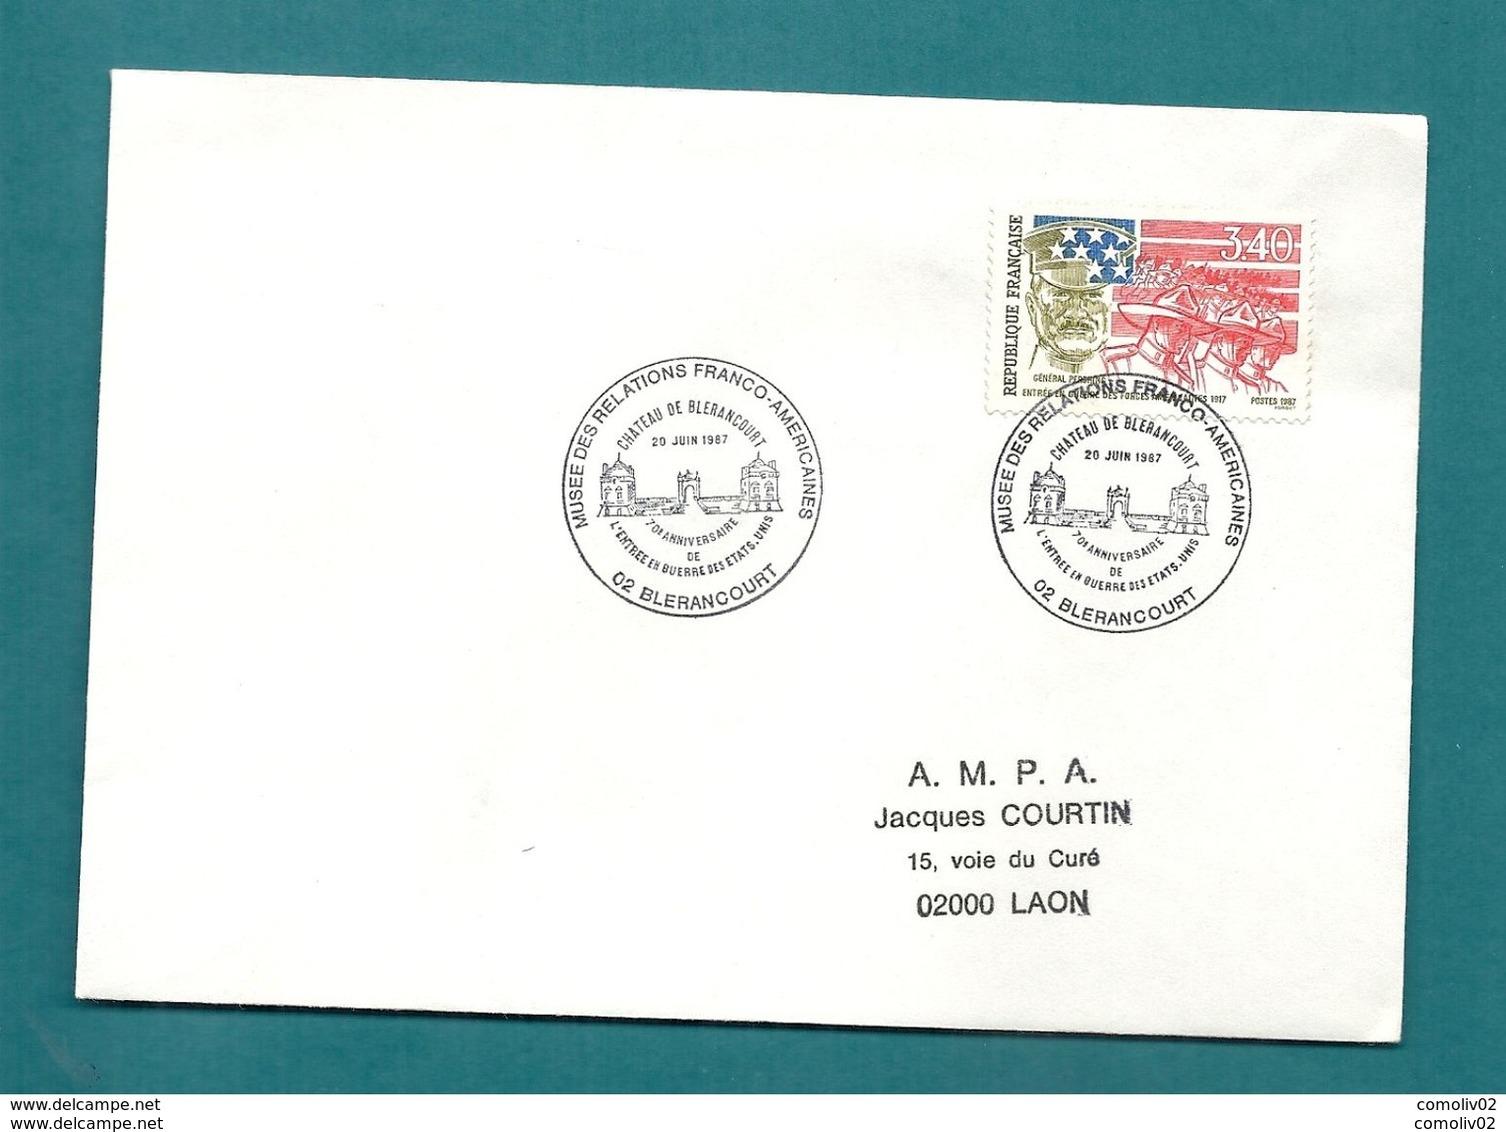 AISNE - BLERANCOURT - MUSEE DES RELATIONS FRANCO AMERICAINES. CHATEAU. 1987 - Bolli Commemorativi